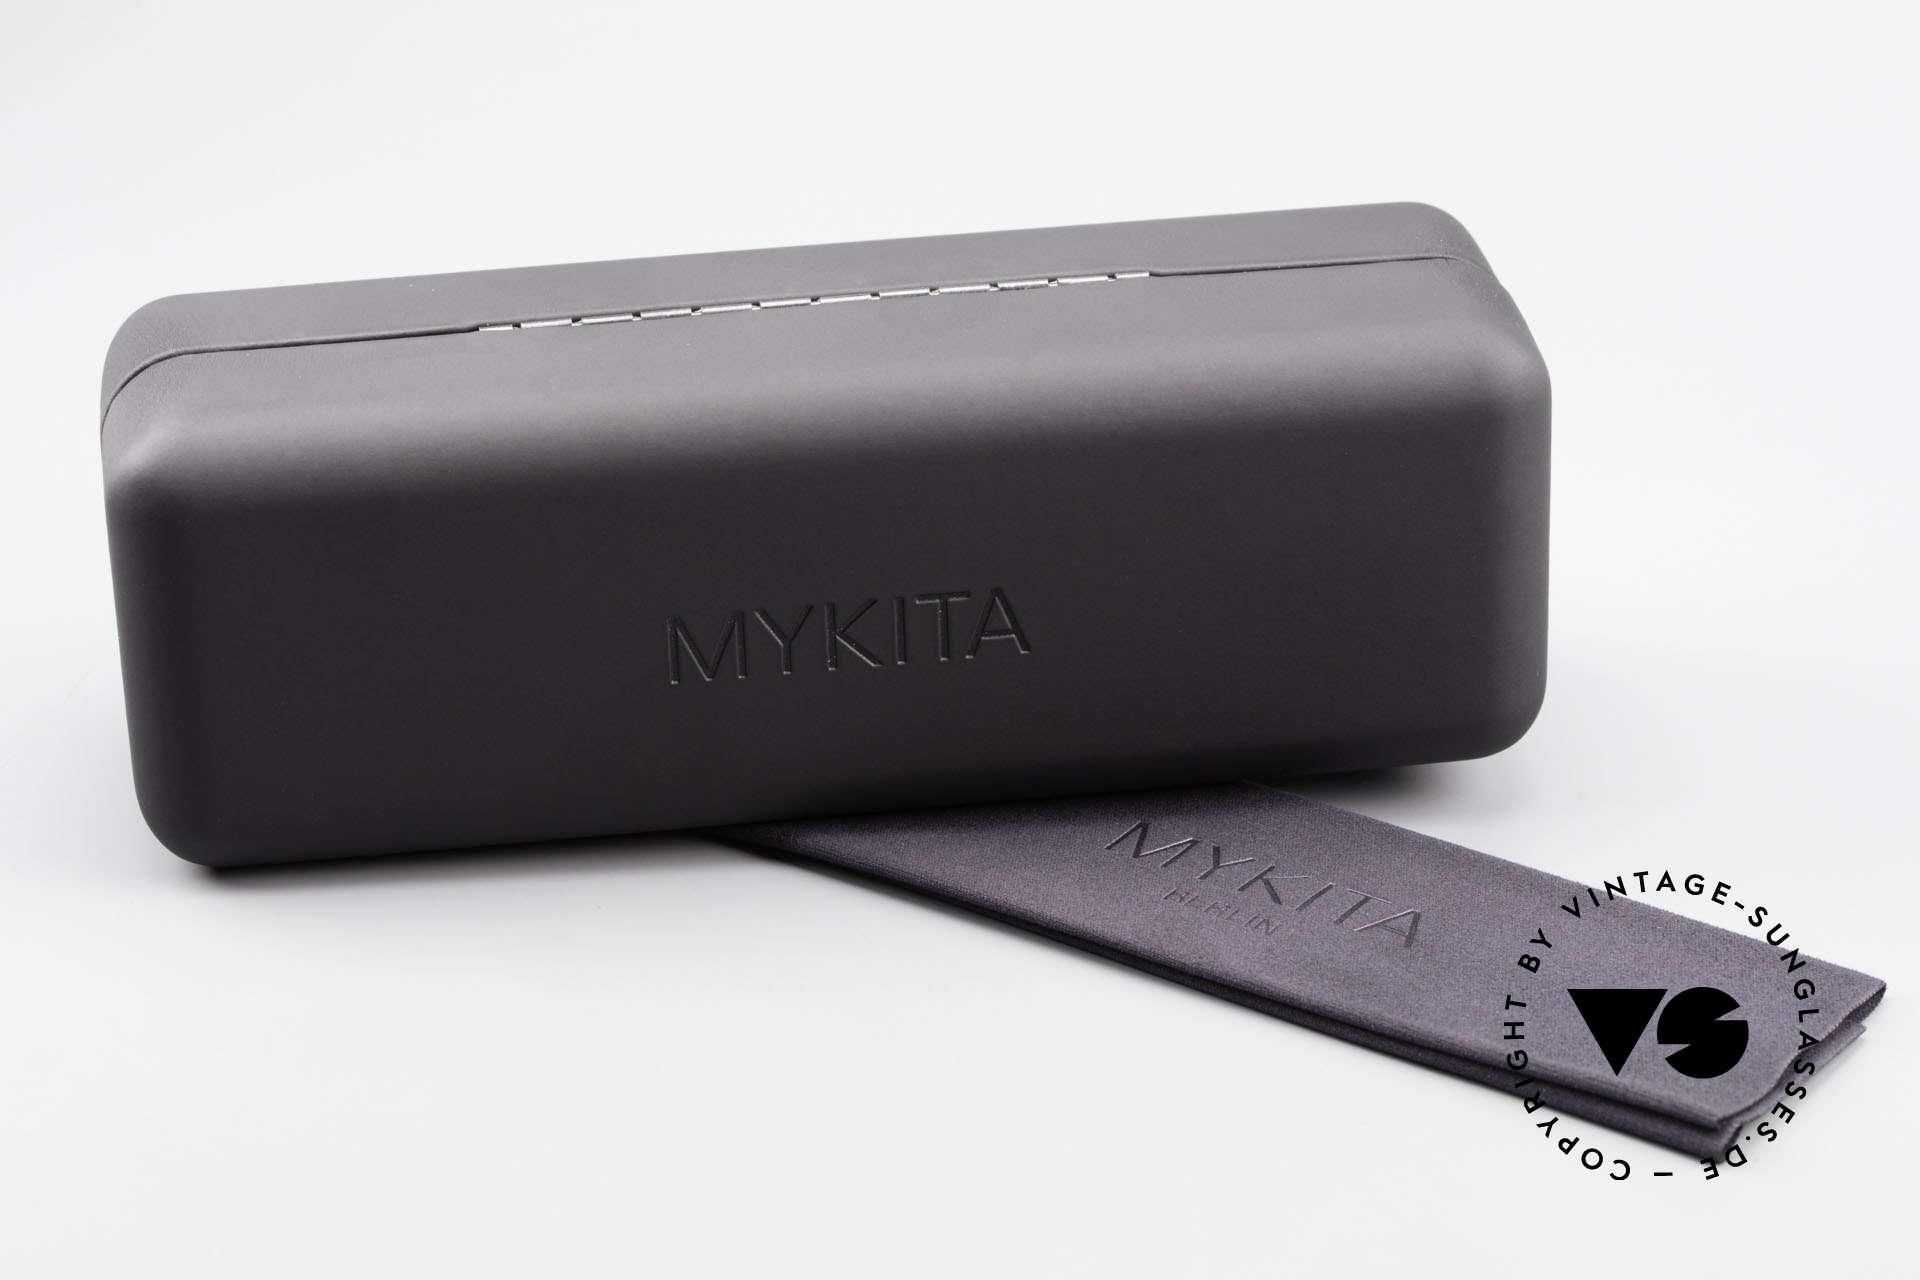 Mykita Rodney Limited Sunglasses From 2011, Size: medium, Made for Men